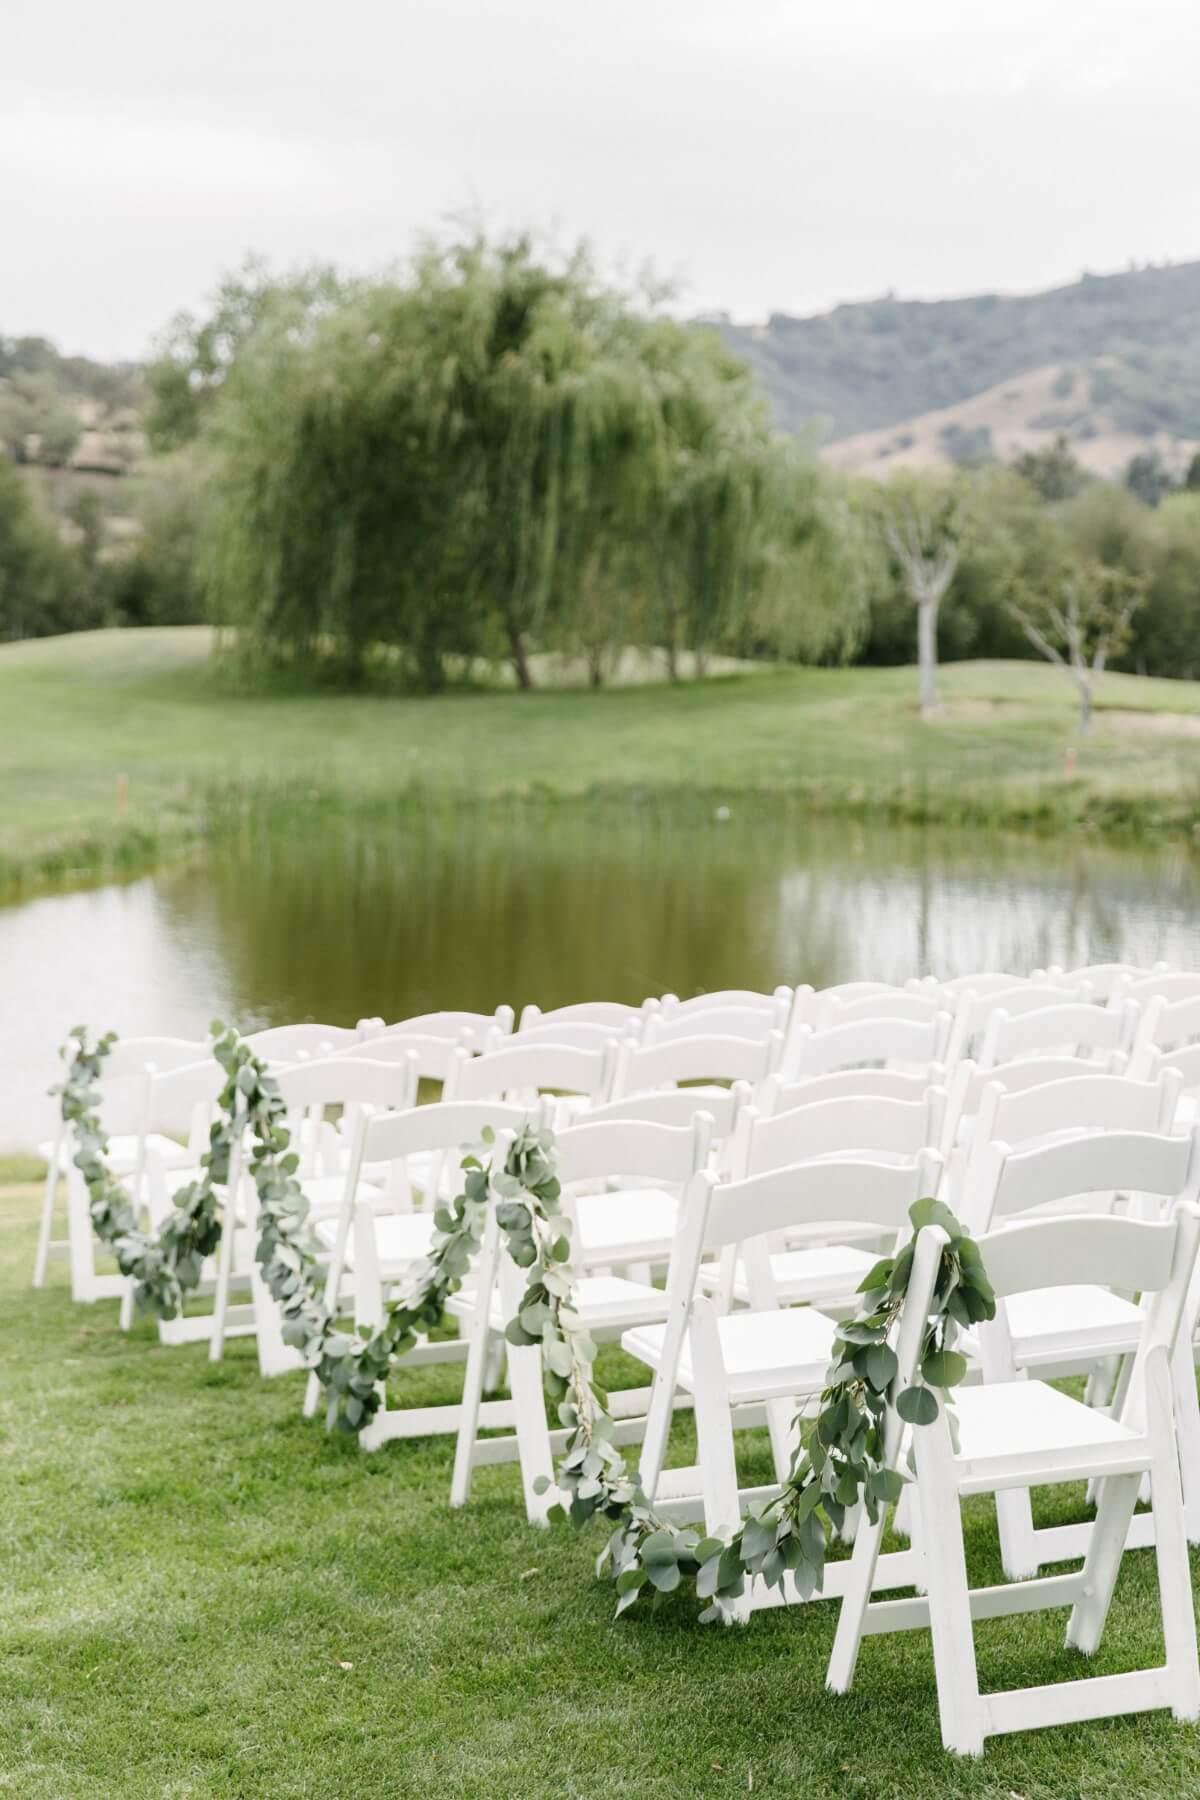 Melanie Duerkopp, Melanie Duerkopp Photography, Santa Barbara Wedding, Solvang, California Wedding Photographer, Wedding Photographer, outdoor wedding, Romantic wedding, blush, grey, rustic